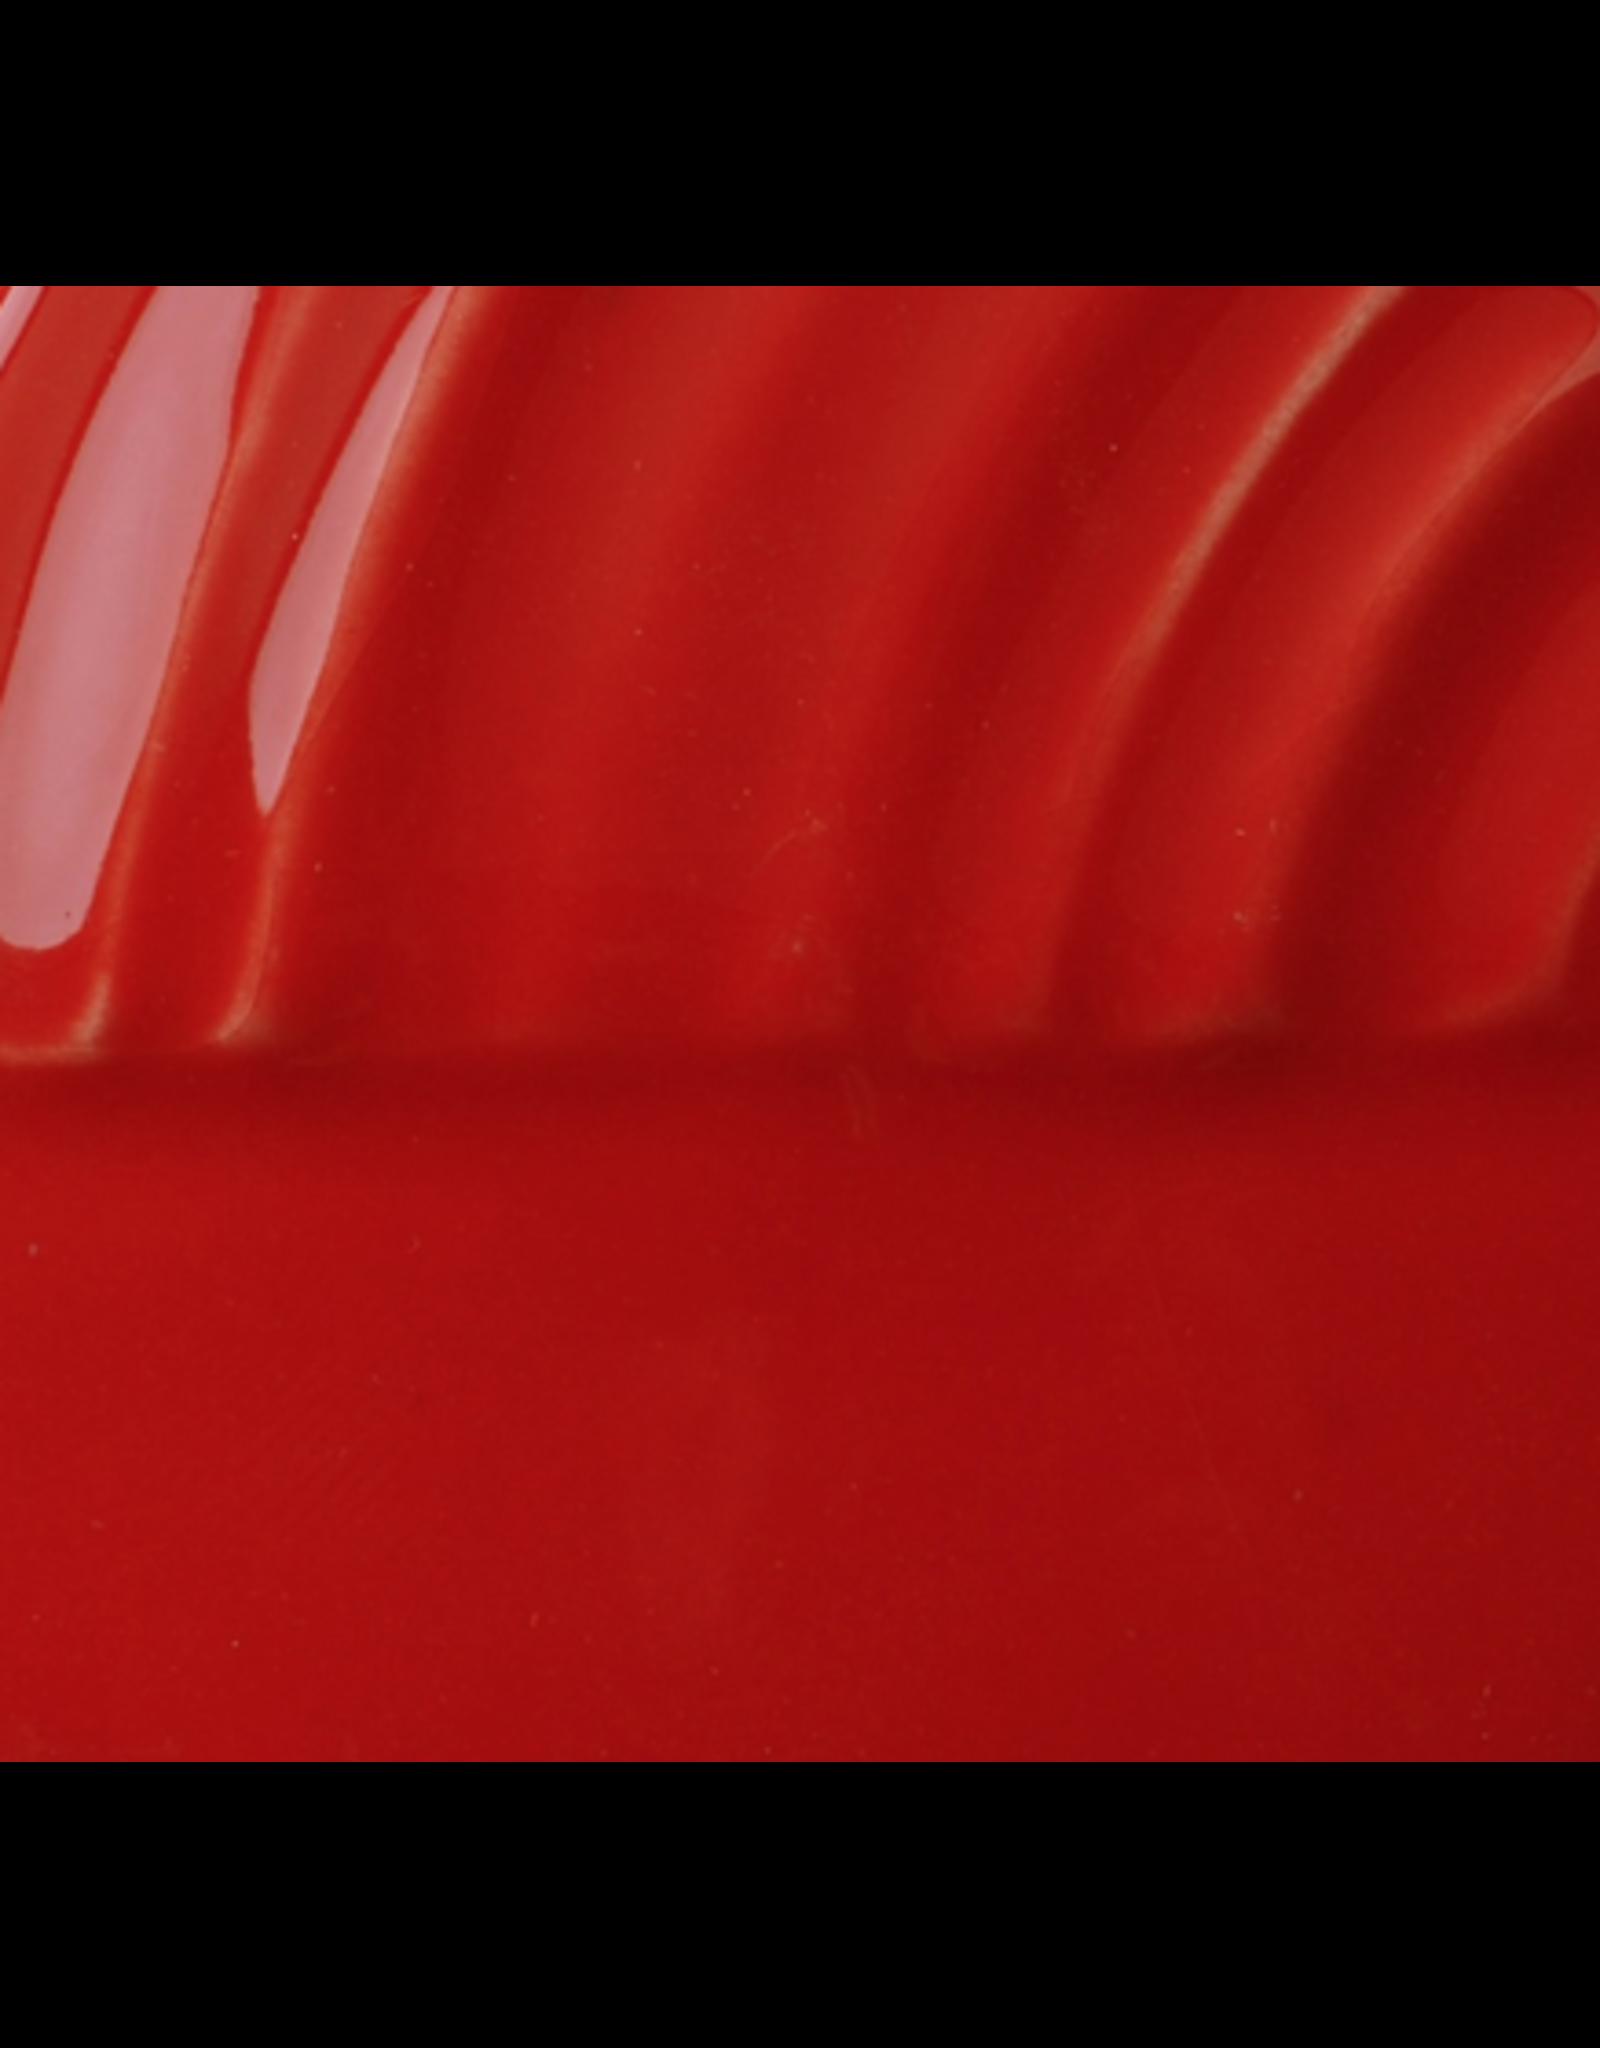 Sneyd Intense Red (Zr, Si, Cd, Se) Glaze Stain